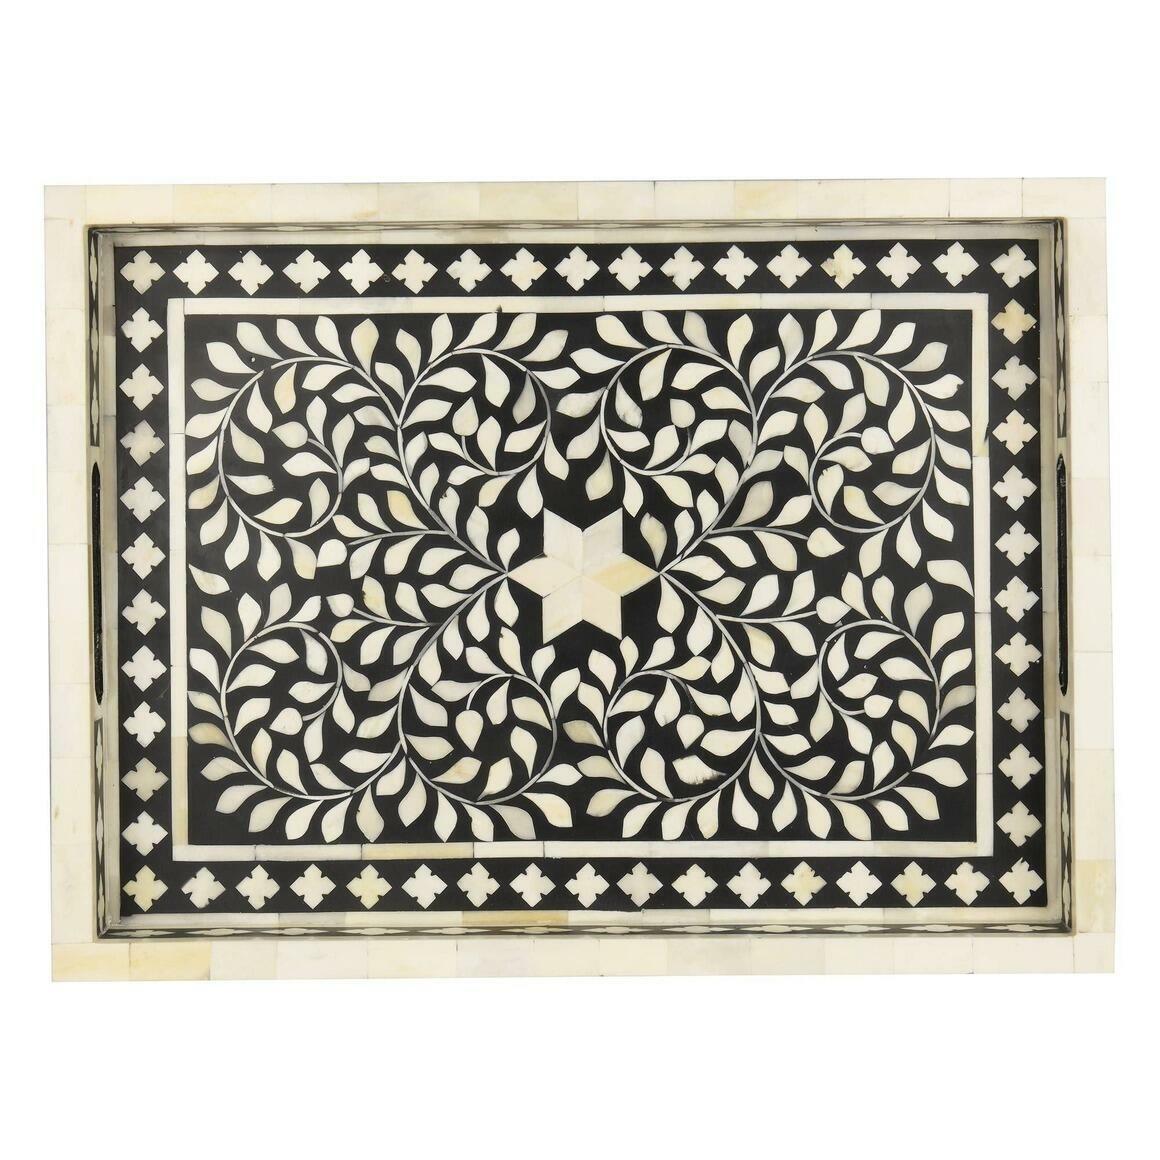 "Jodhpur Bone Inlay Décor Tray in Midnight Black (20""x15"")   Trada Marketplace"